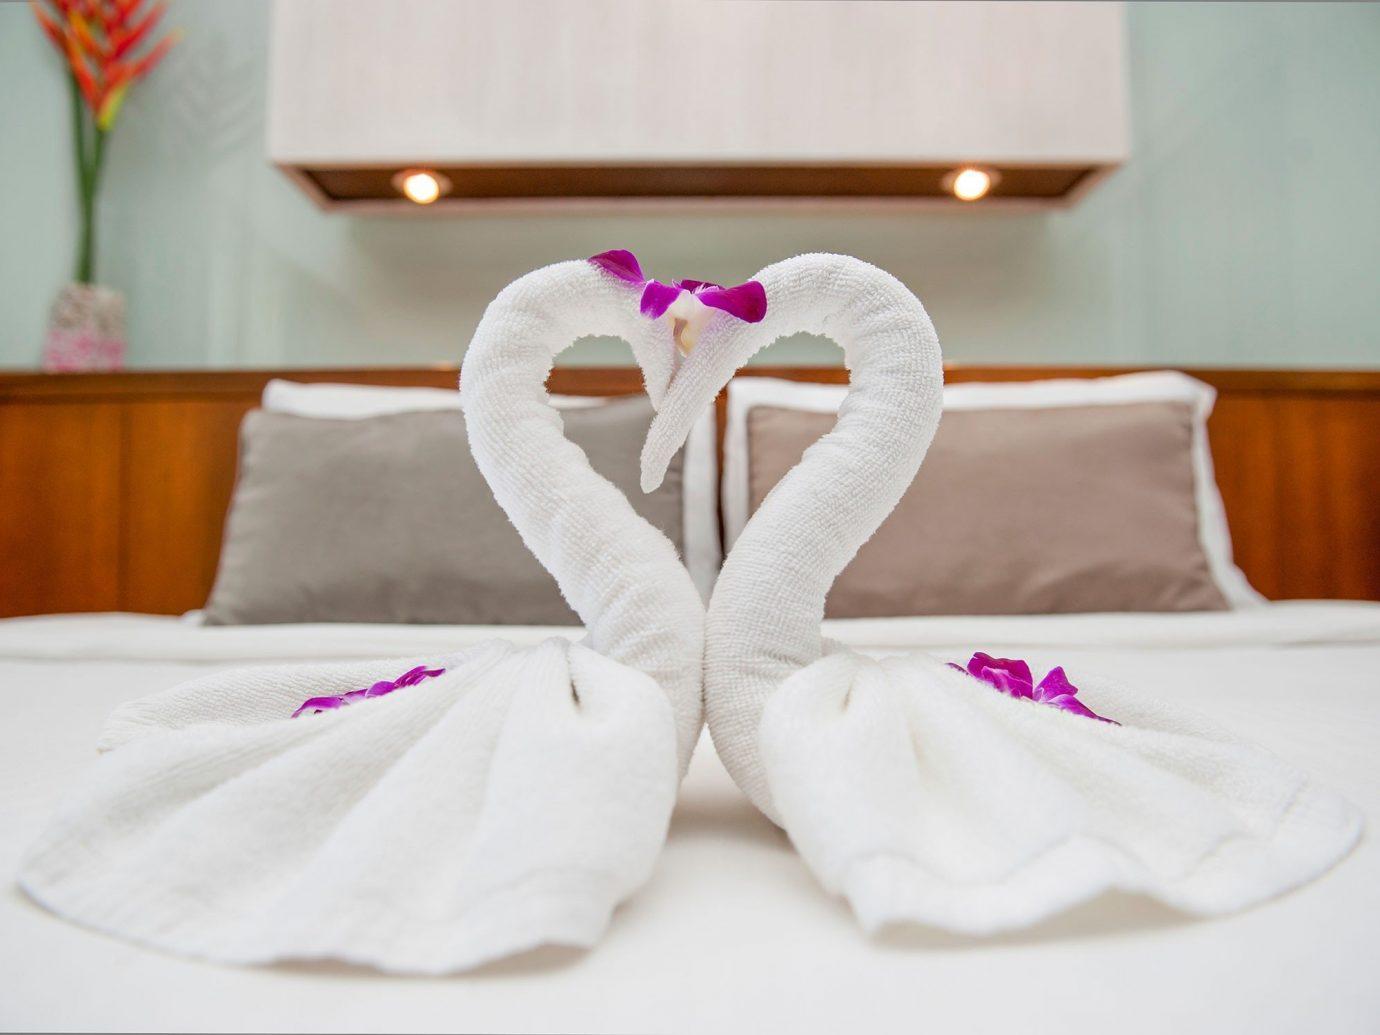 Offbeat indoor white pink product petal footwear cloth dress organ bed furniture textile flower